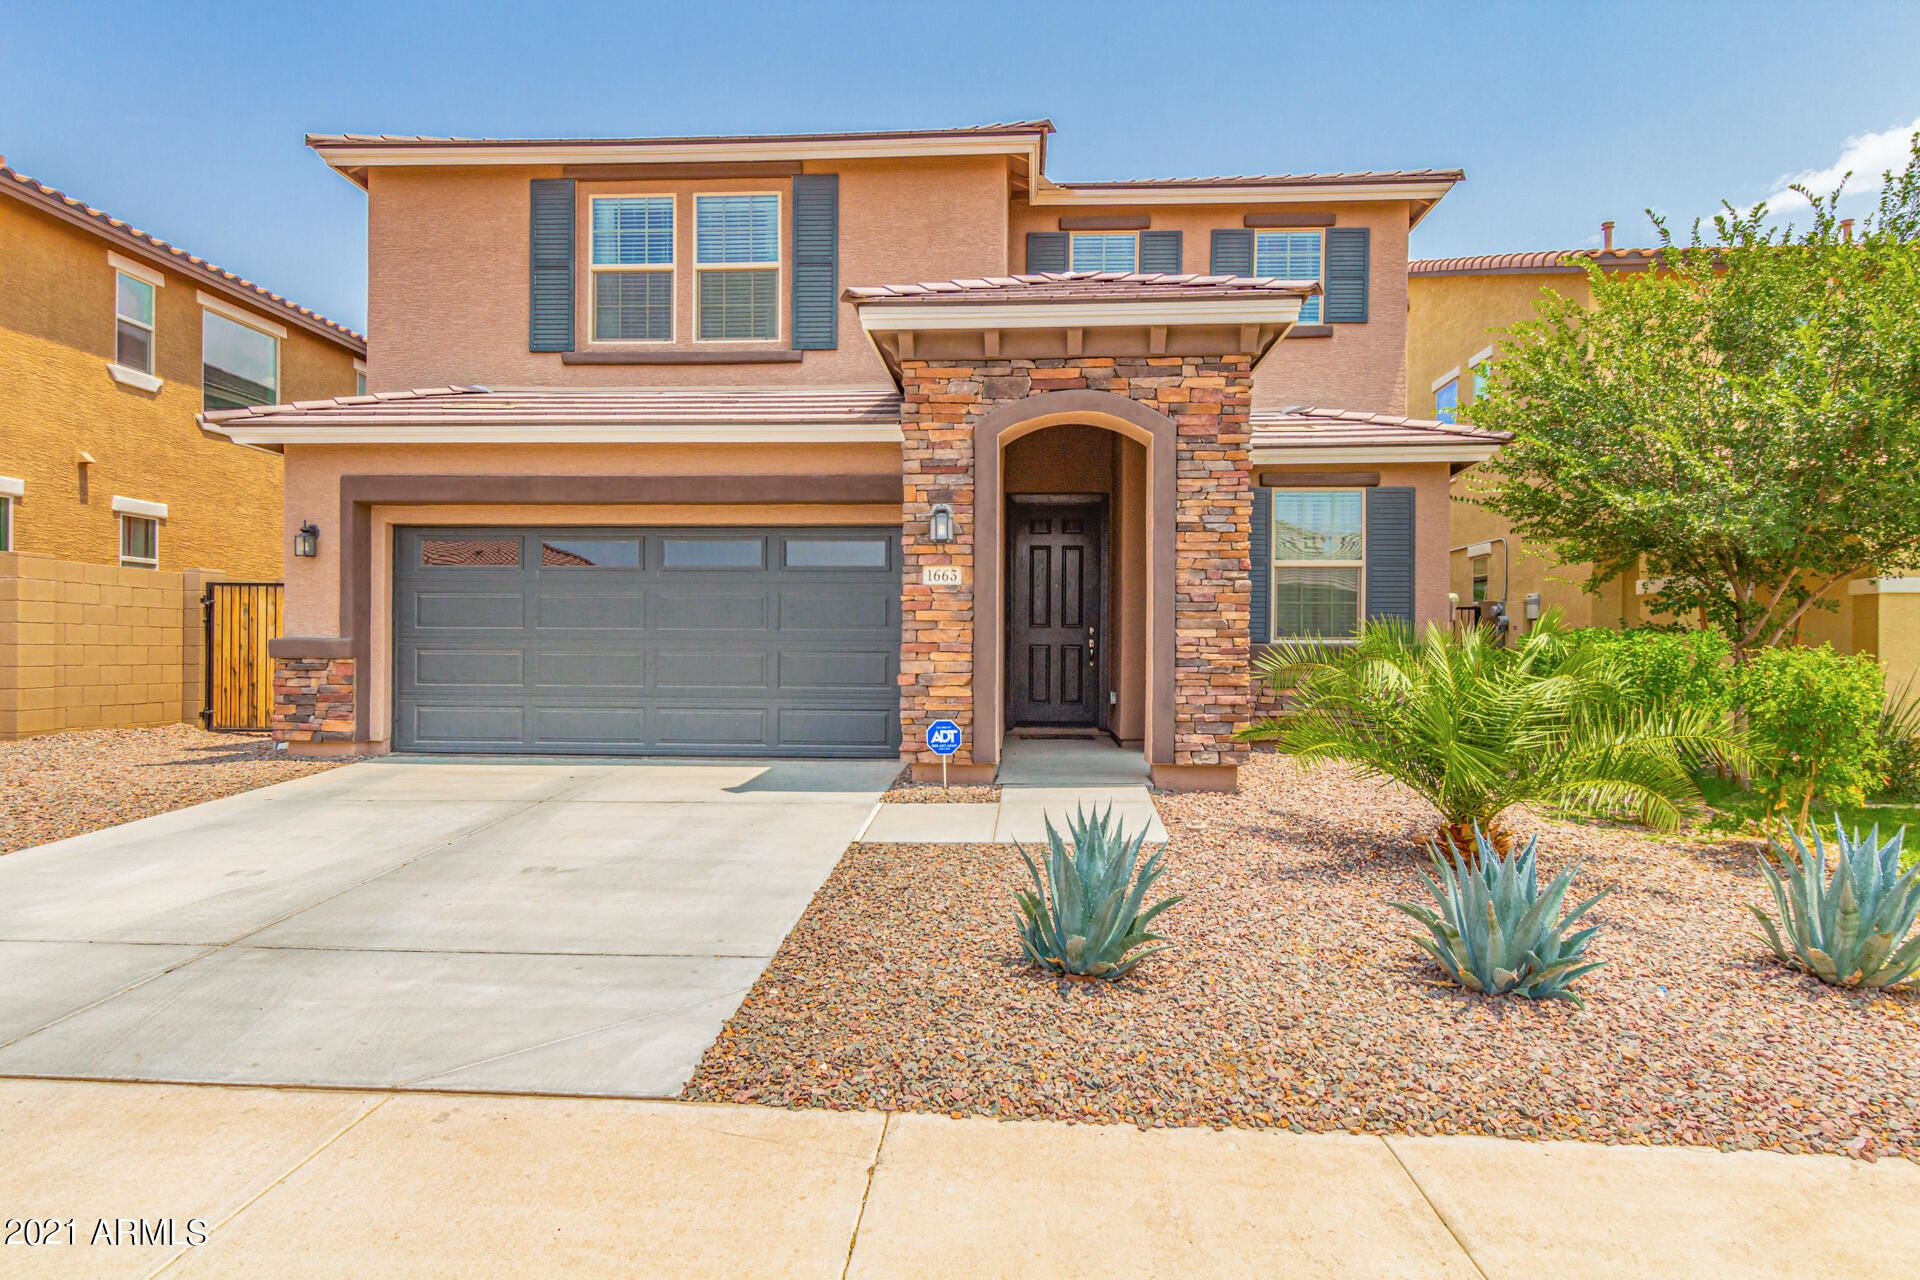 Photo of 1663 N 212Th Drive, Buckeye, AZ 85396 (MLS # 6269215)